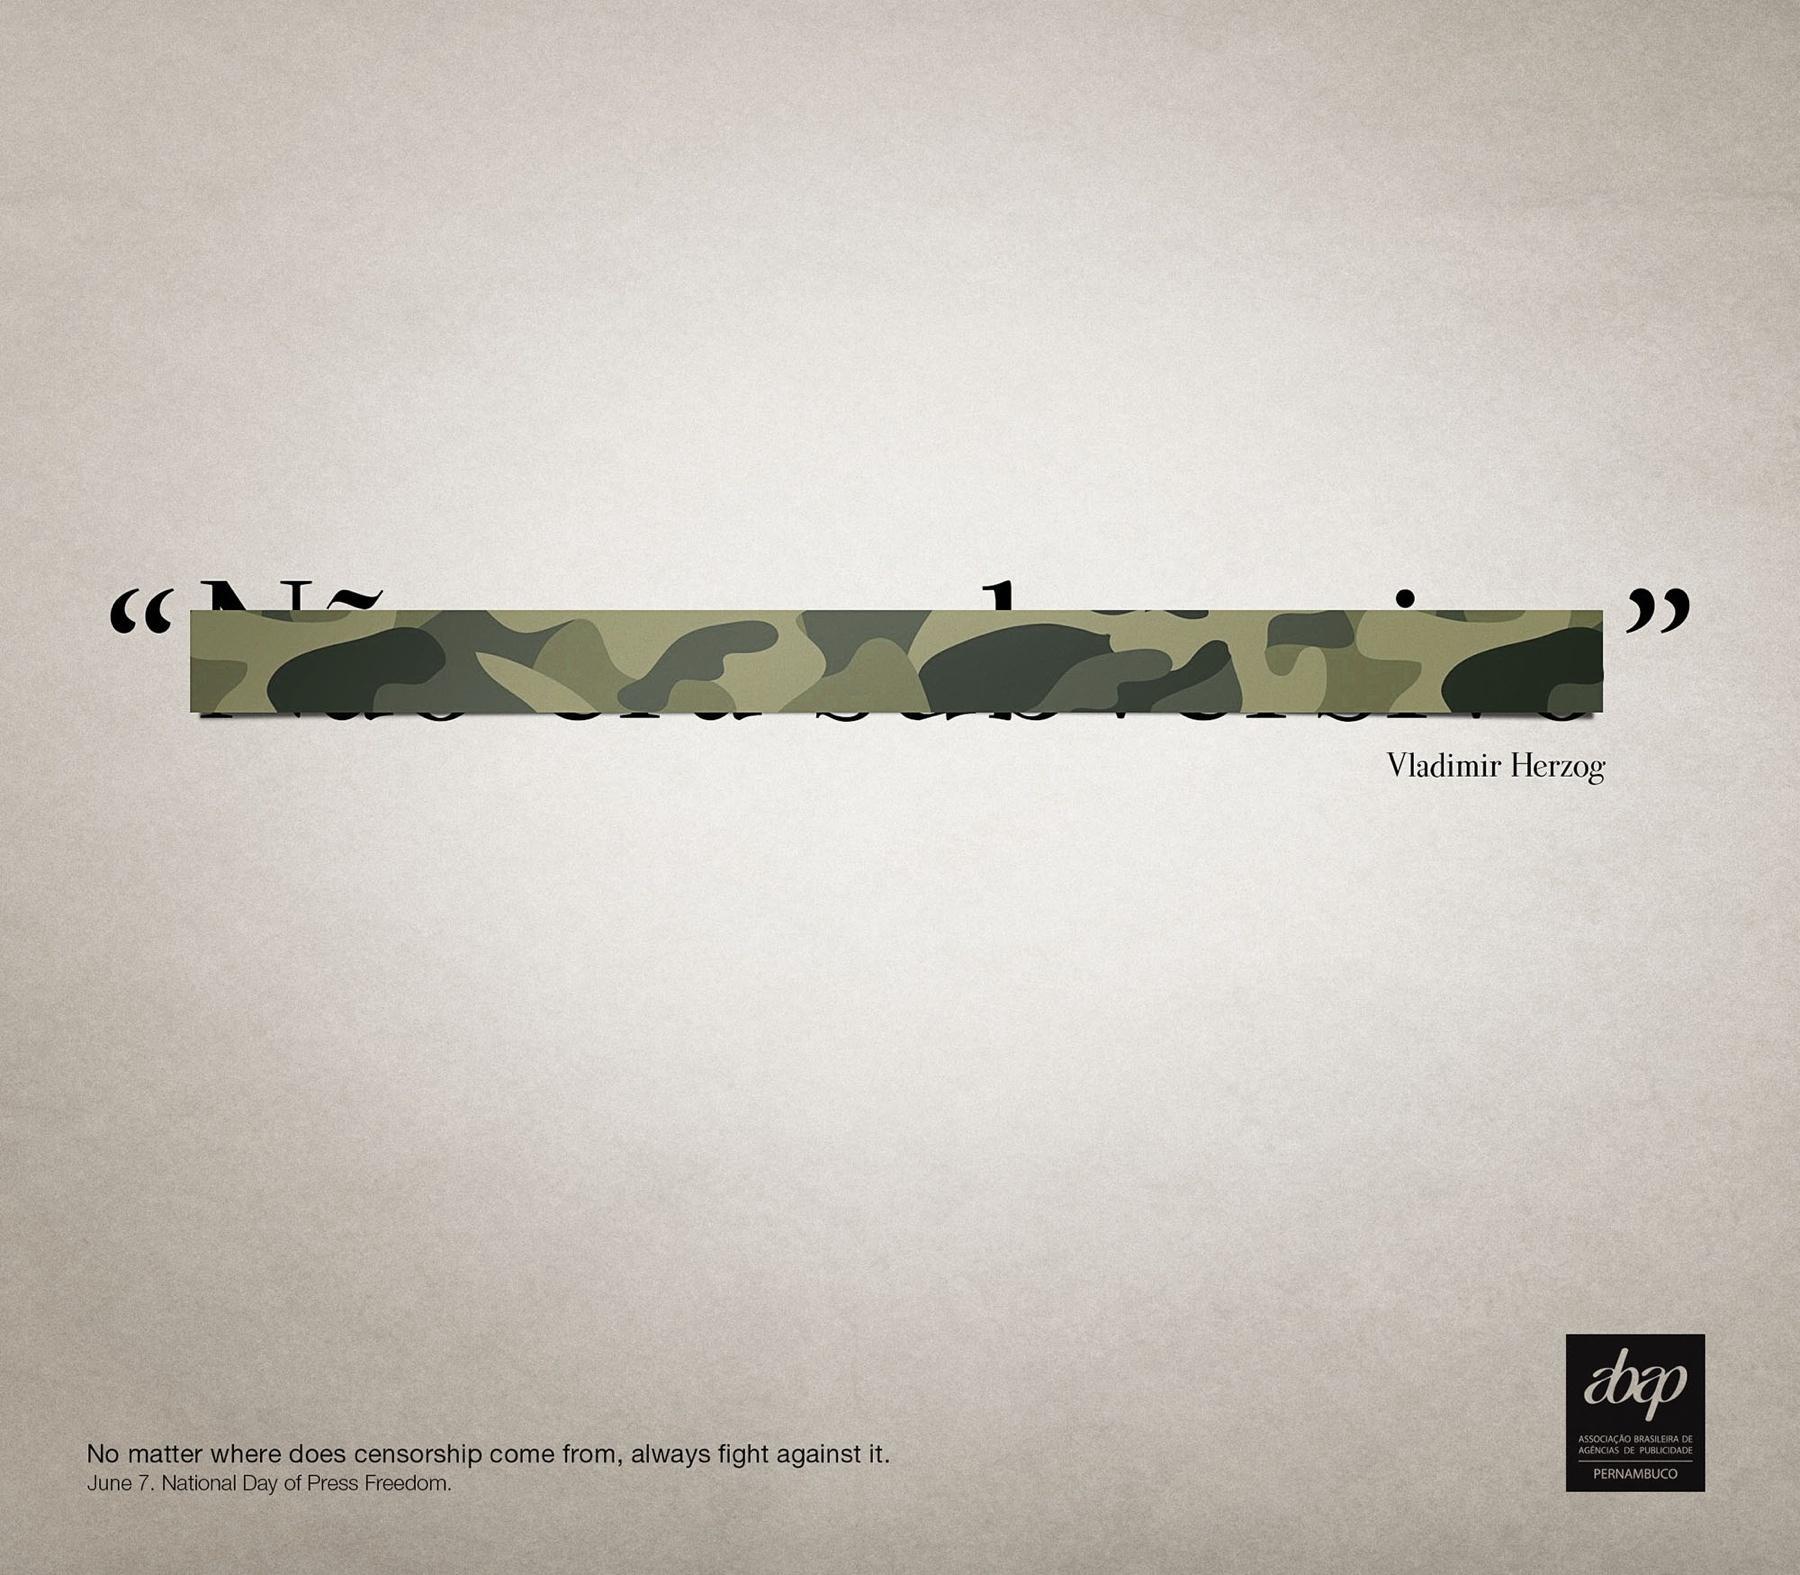 Abap Print Ad -  Vladimir Herzog